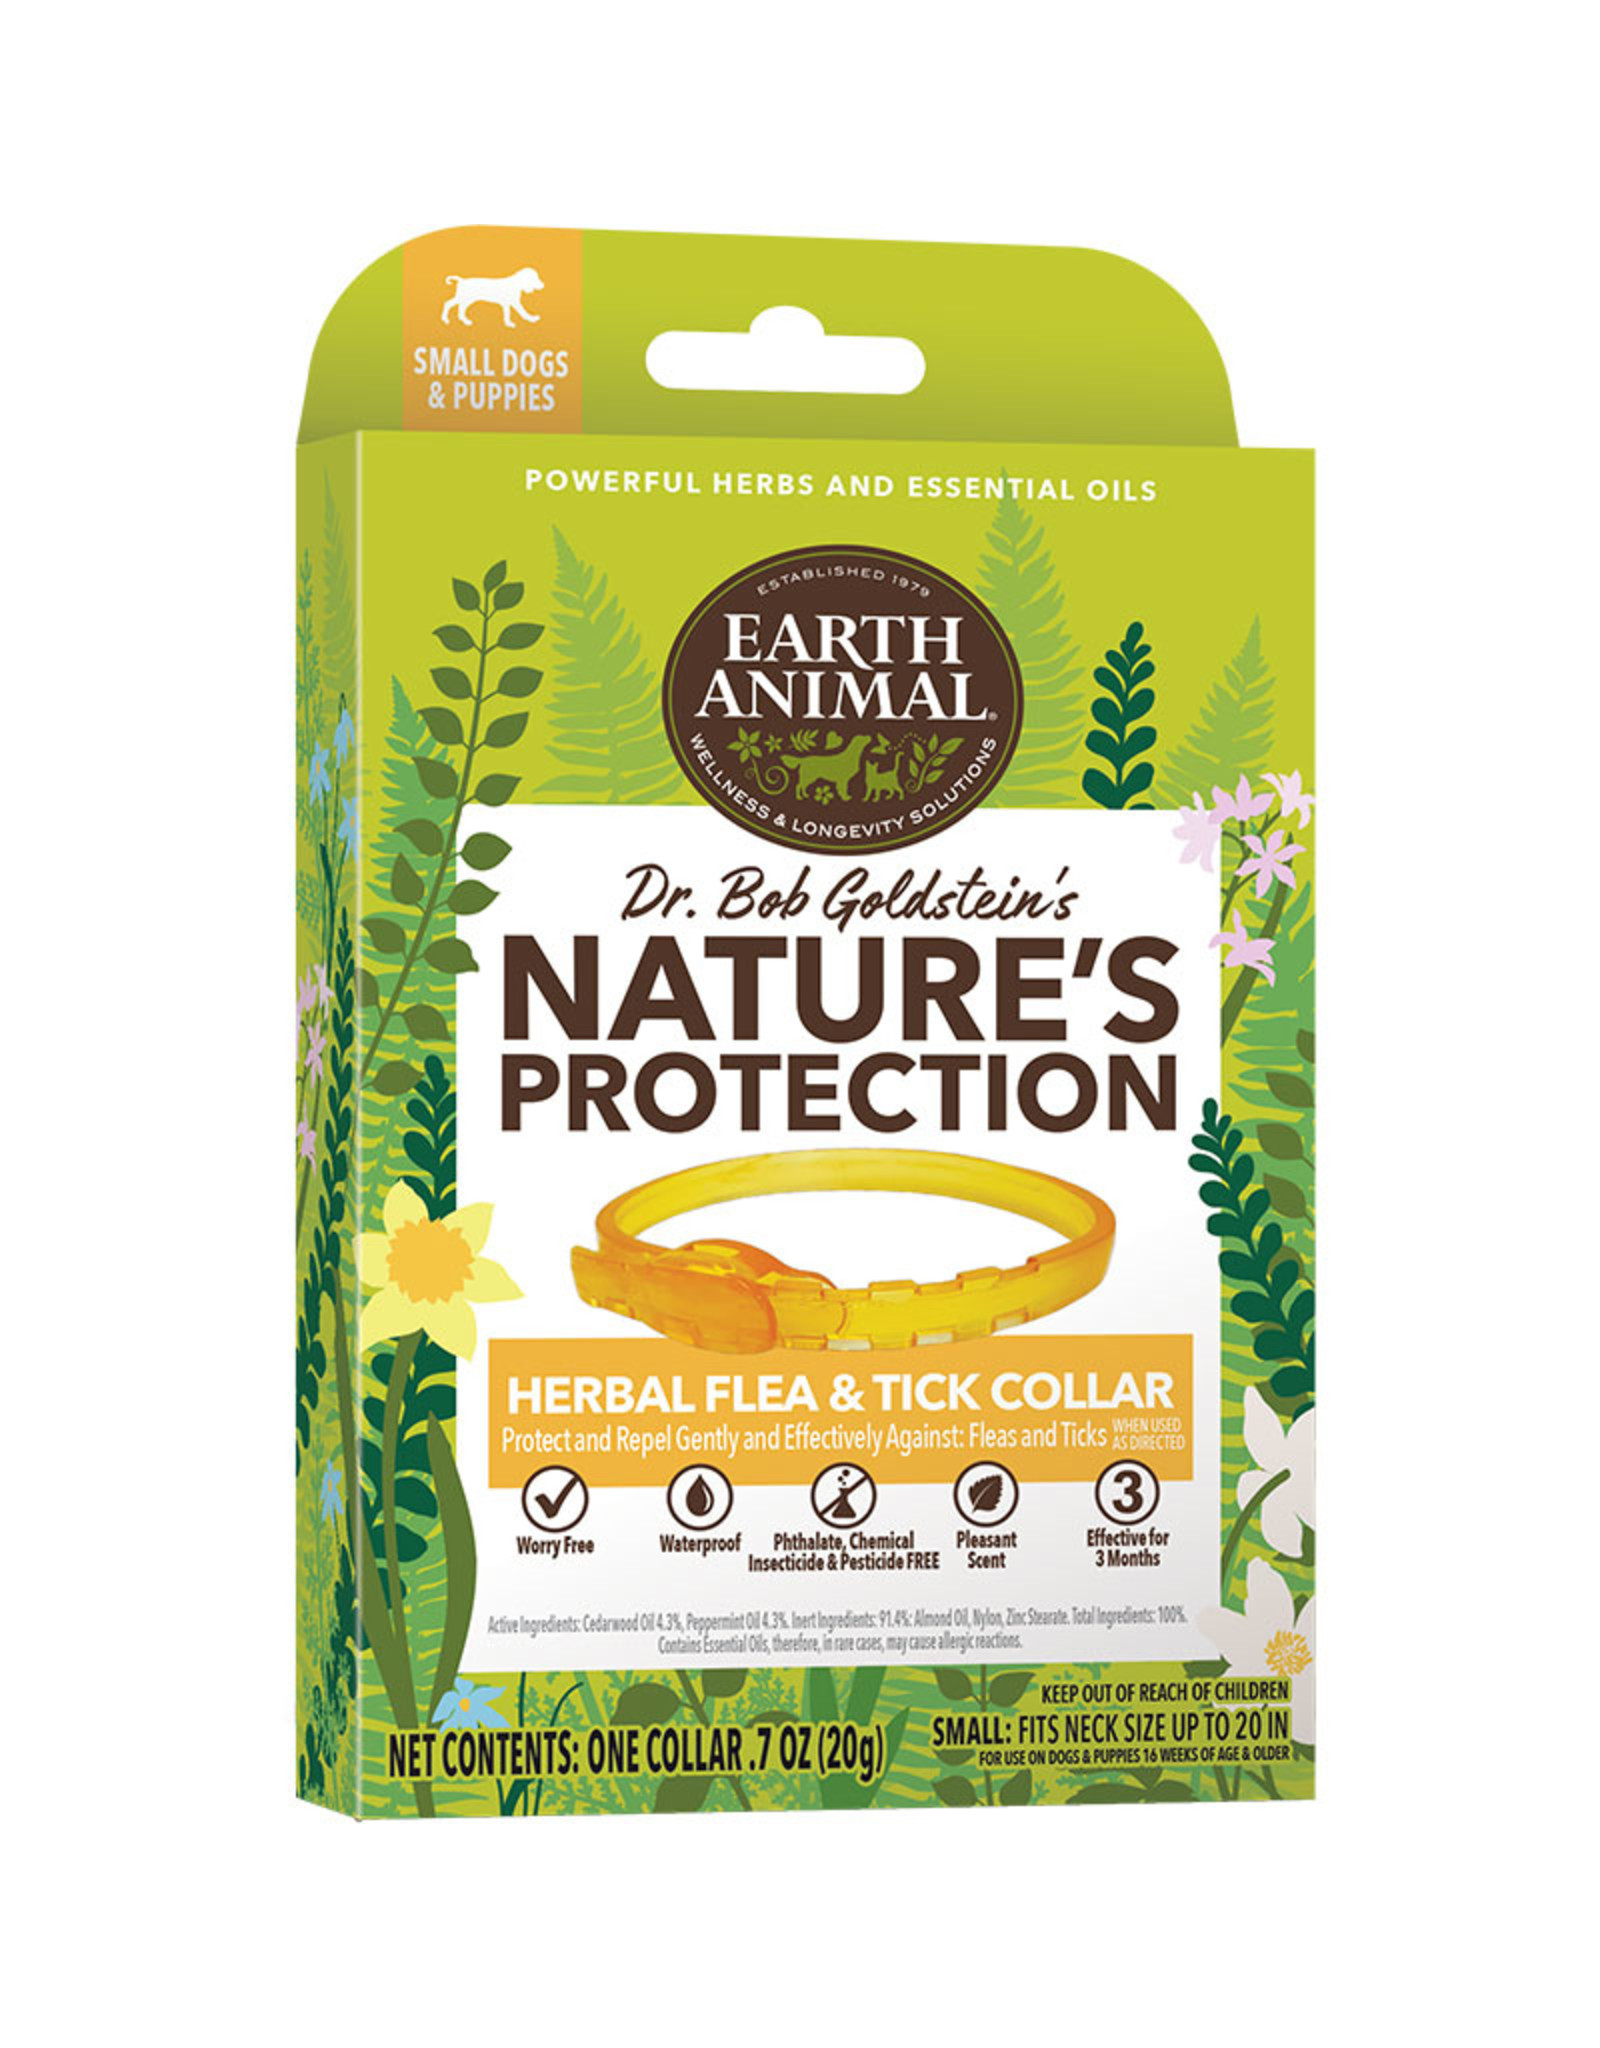 Earth Animal Earth Animal Nature's Protector Herbal Flea & Tick Collar for Dogs